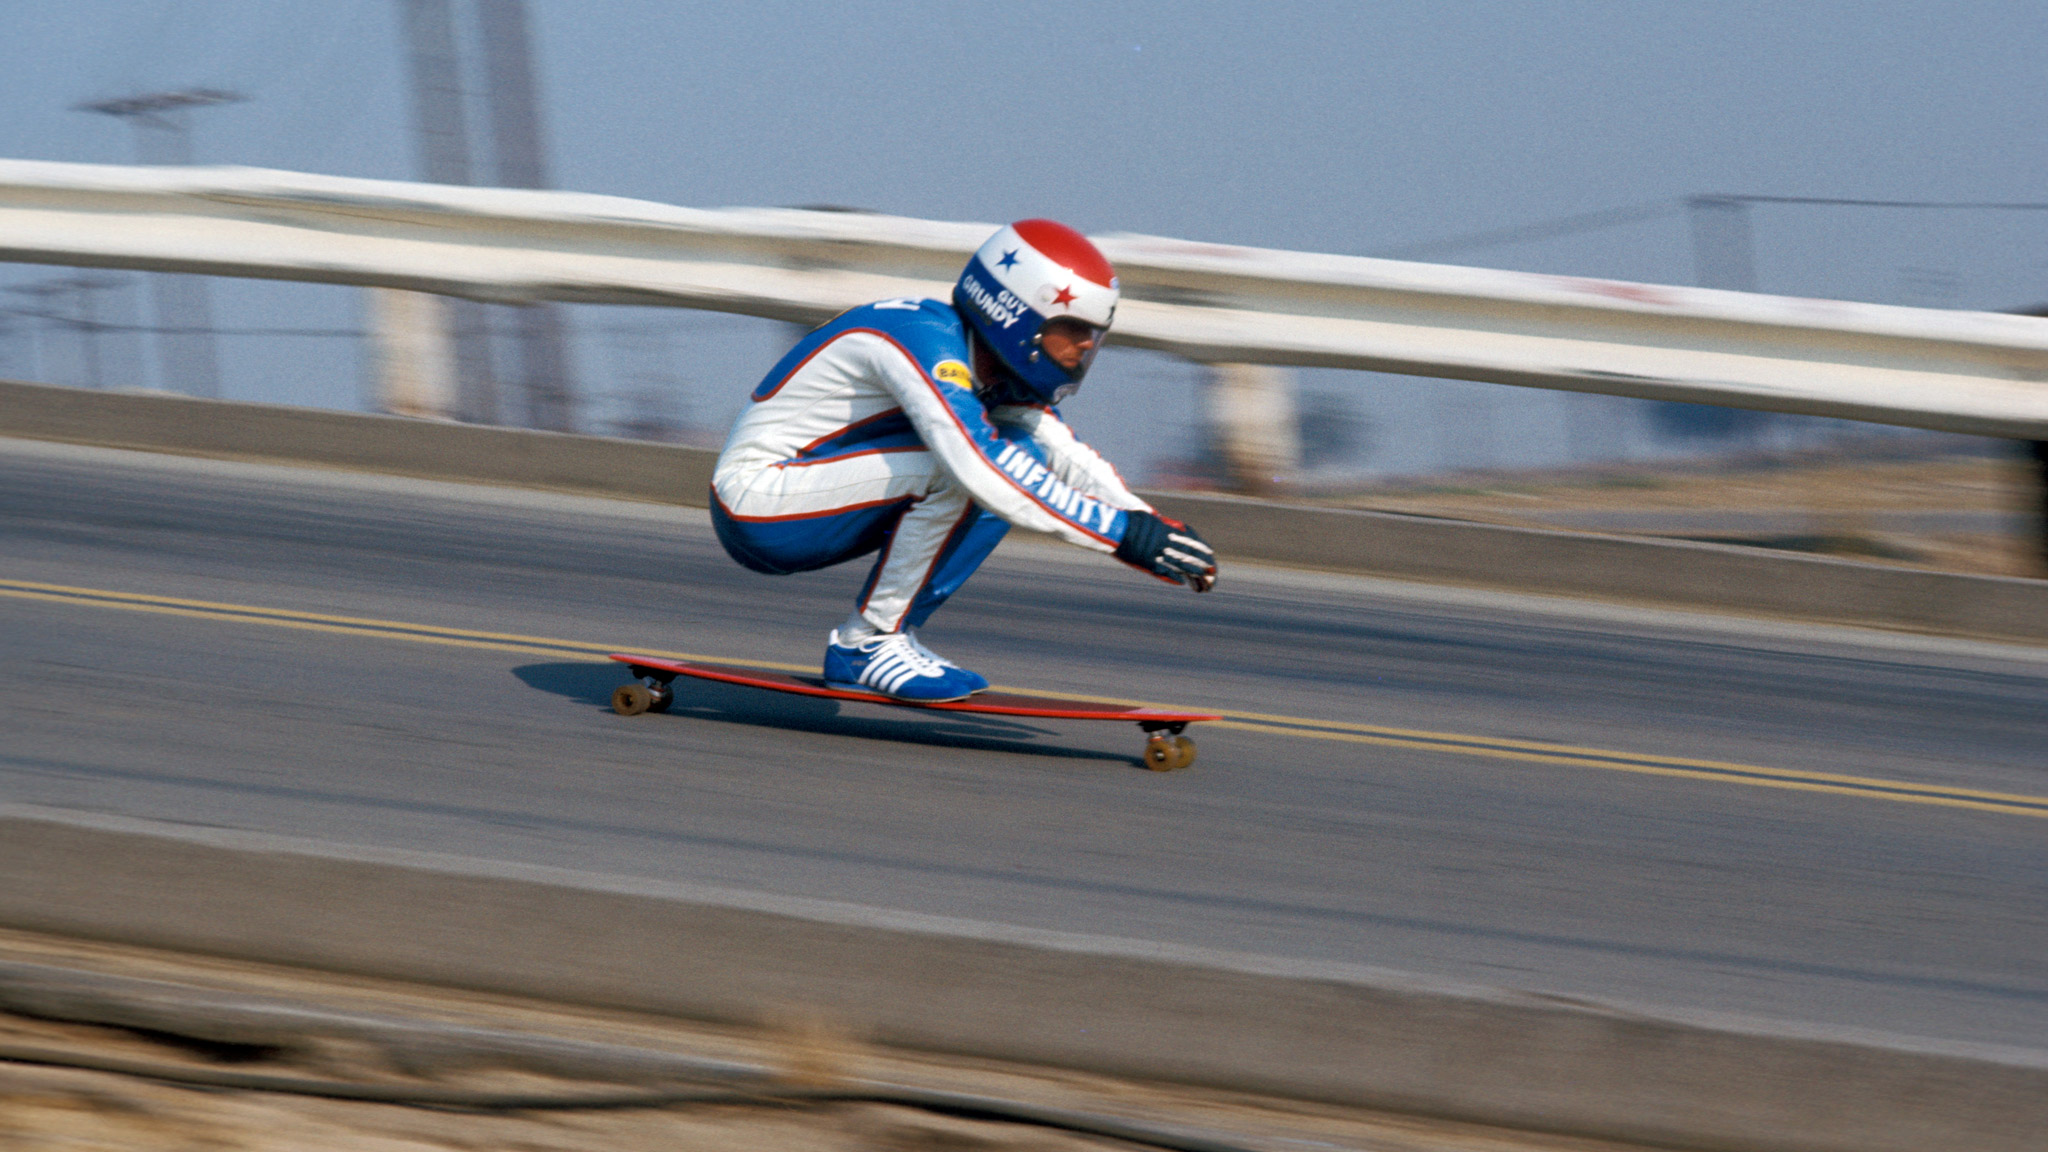 Downhill skateboarding vintage 70s